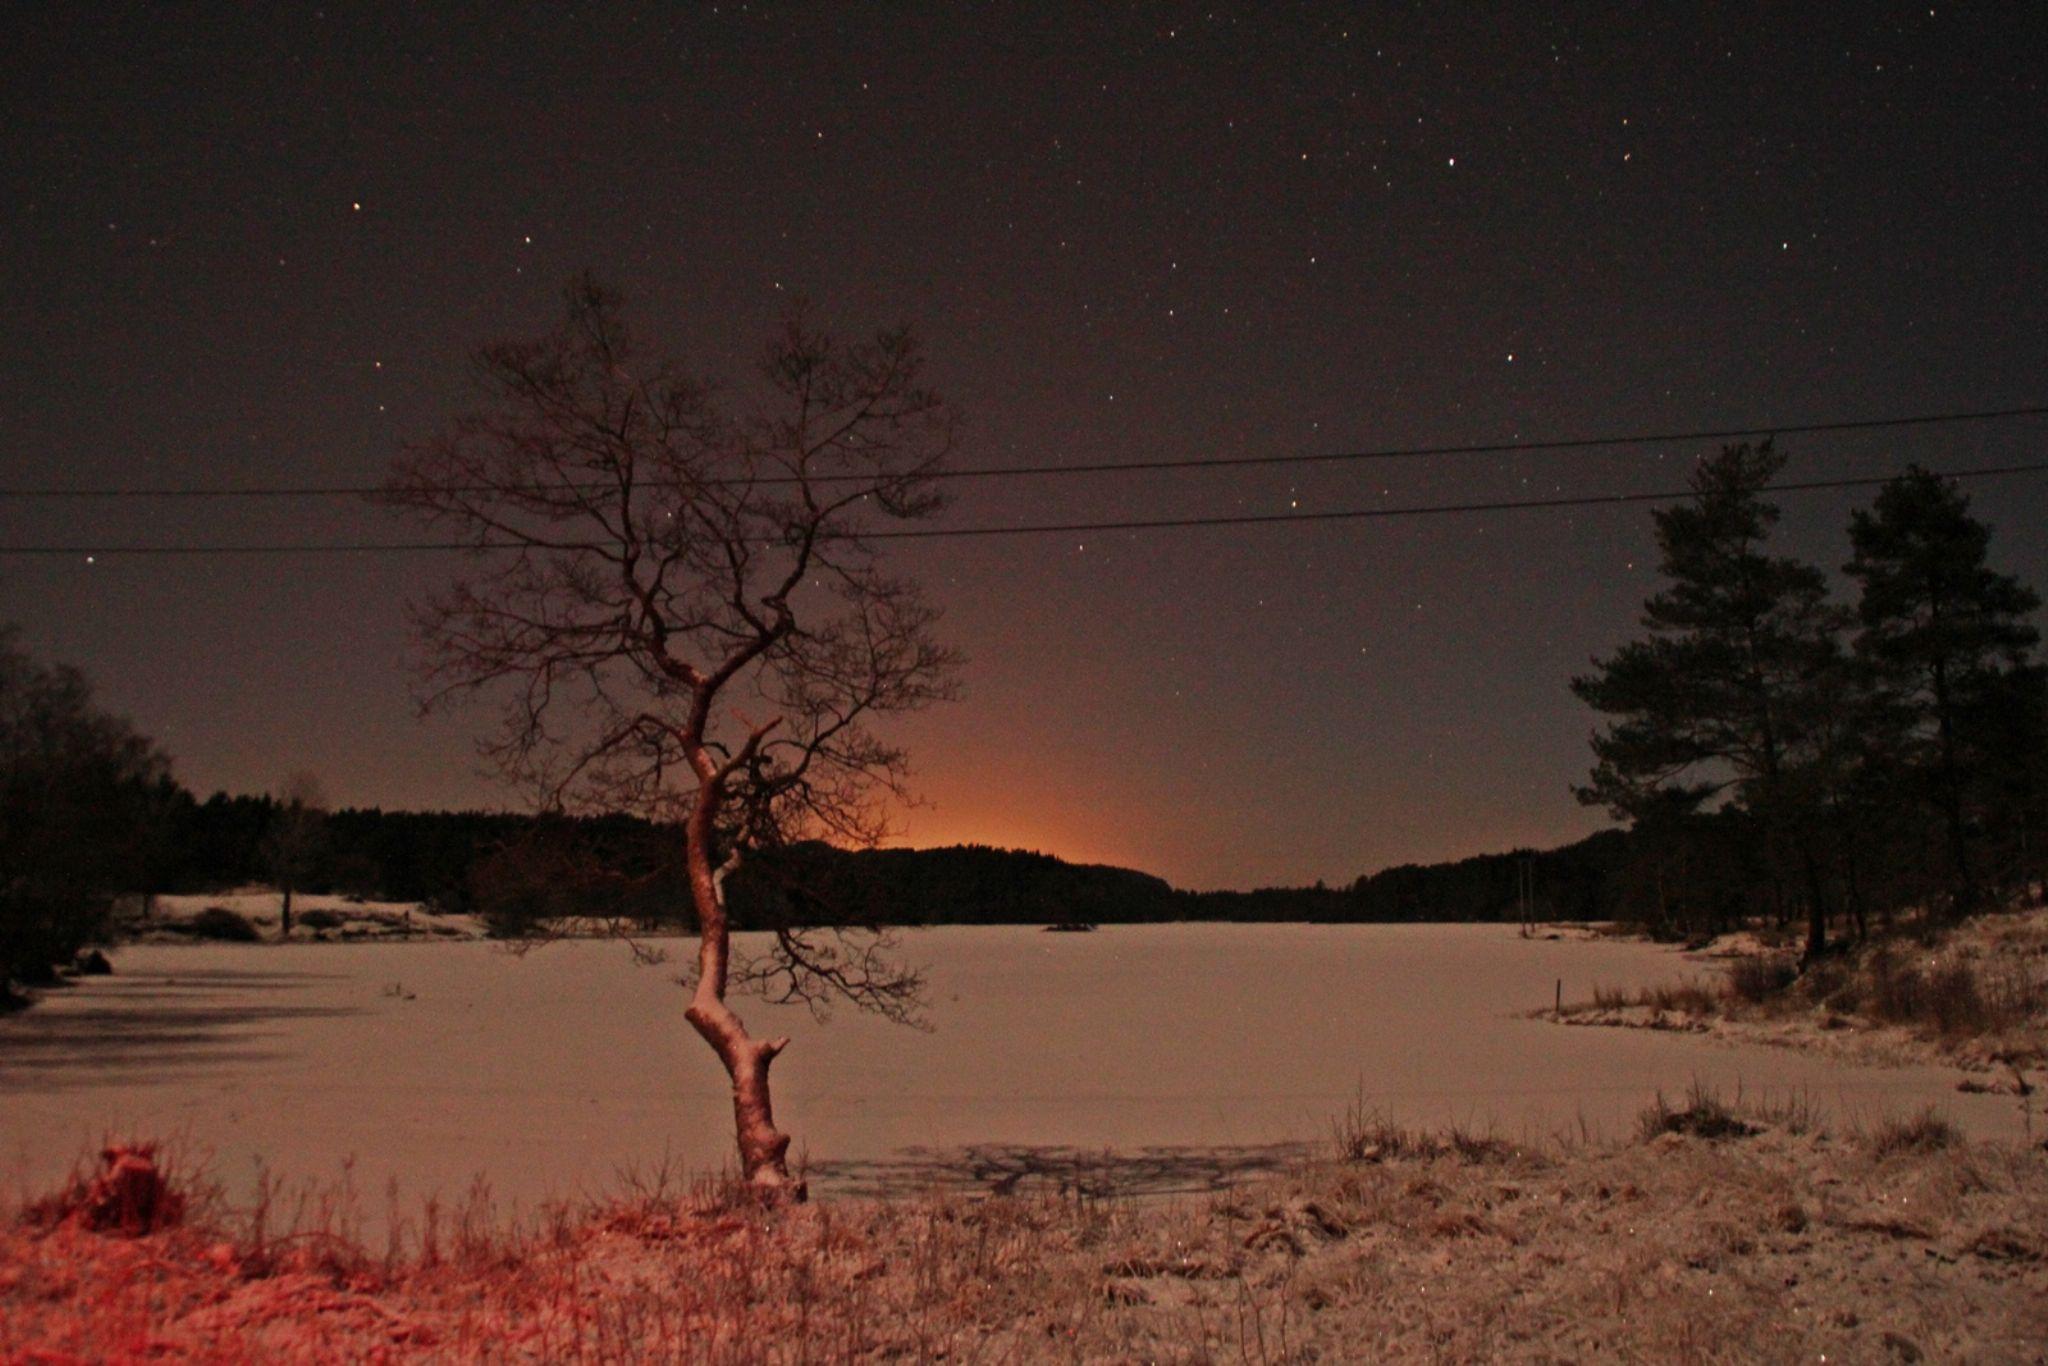 Stary Night by vidar.totland